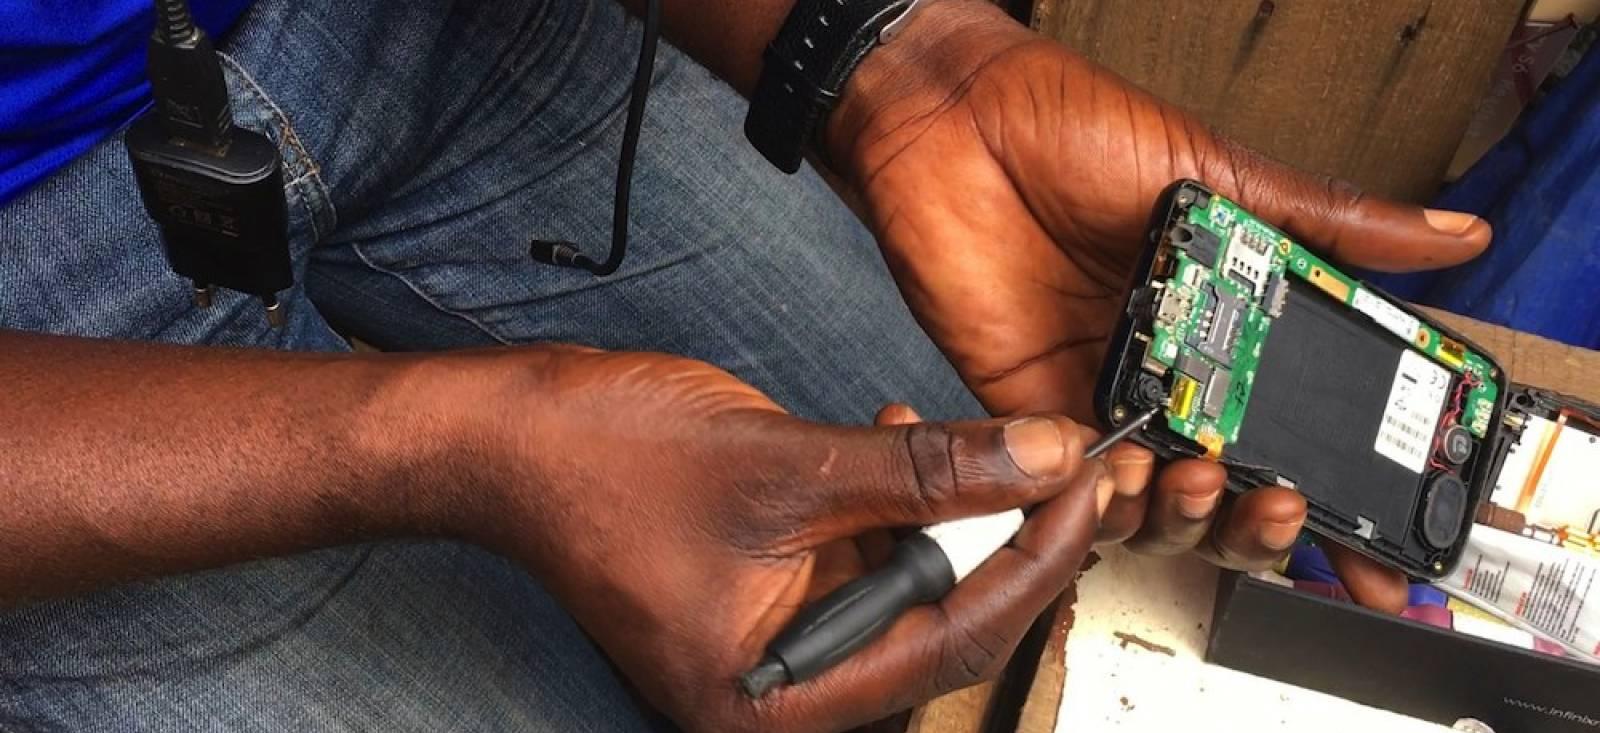 Chinafrika. mobil